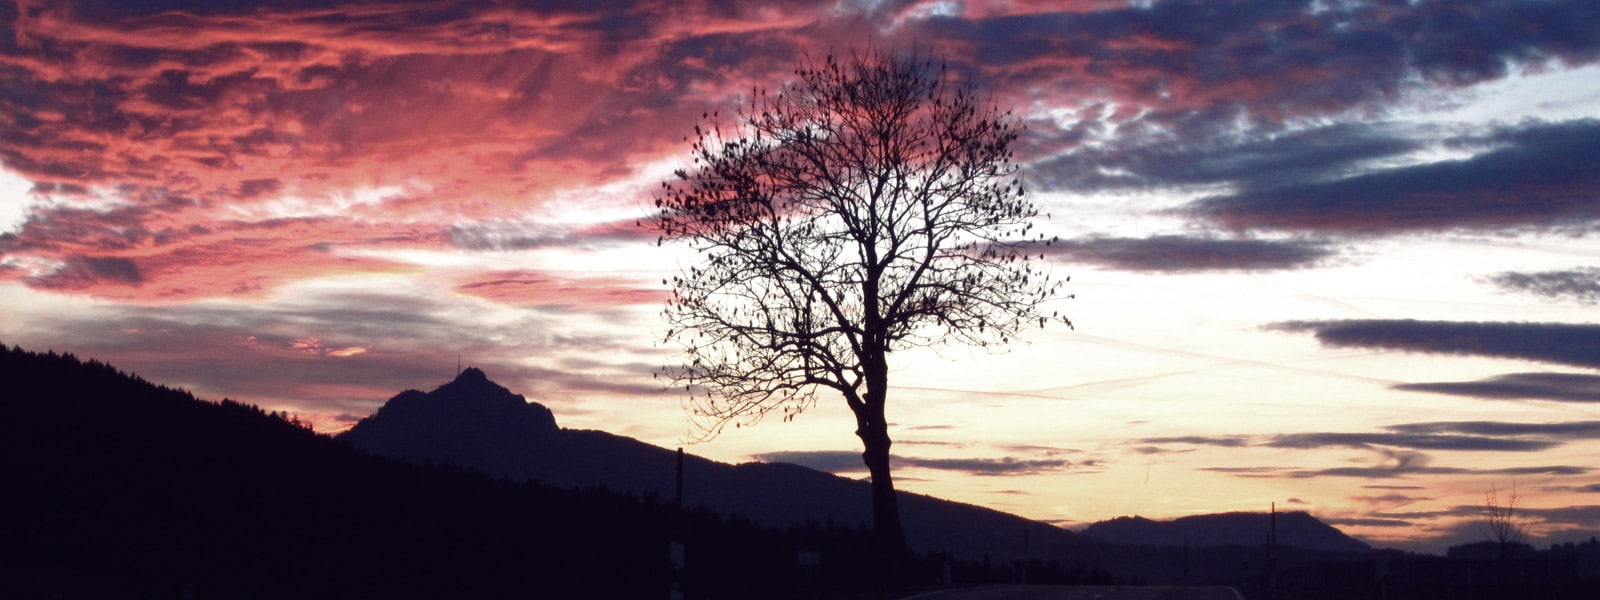 Allgäu Sonnenuntergang